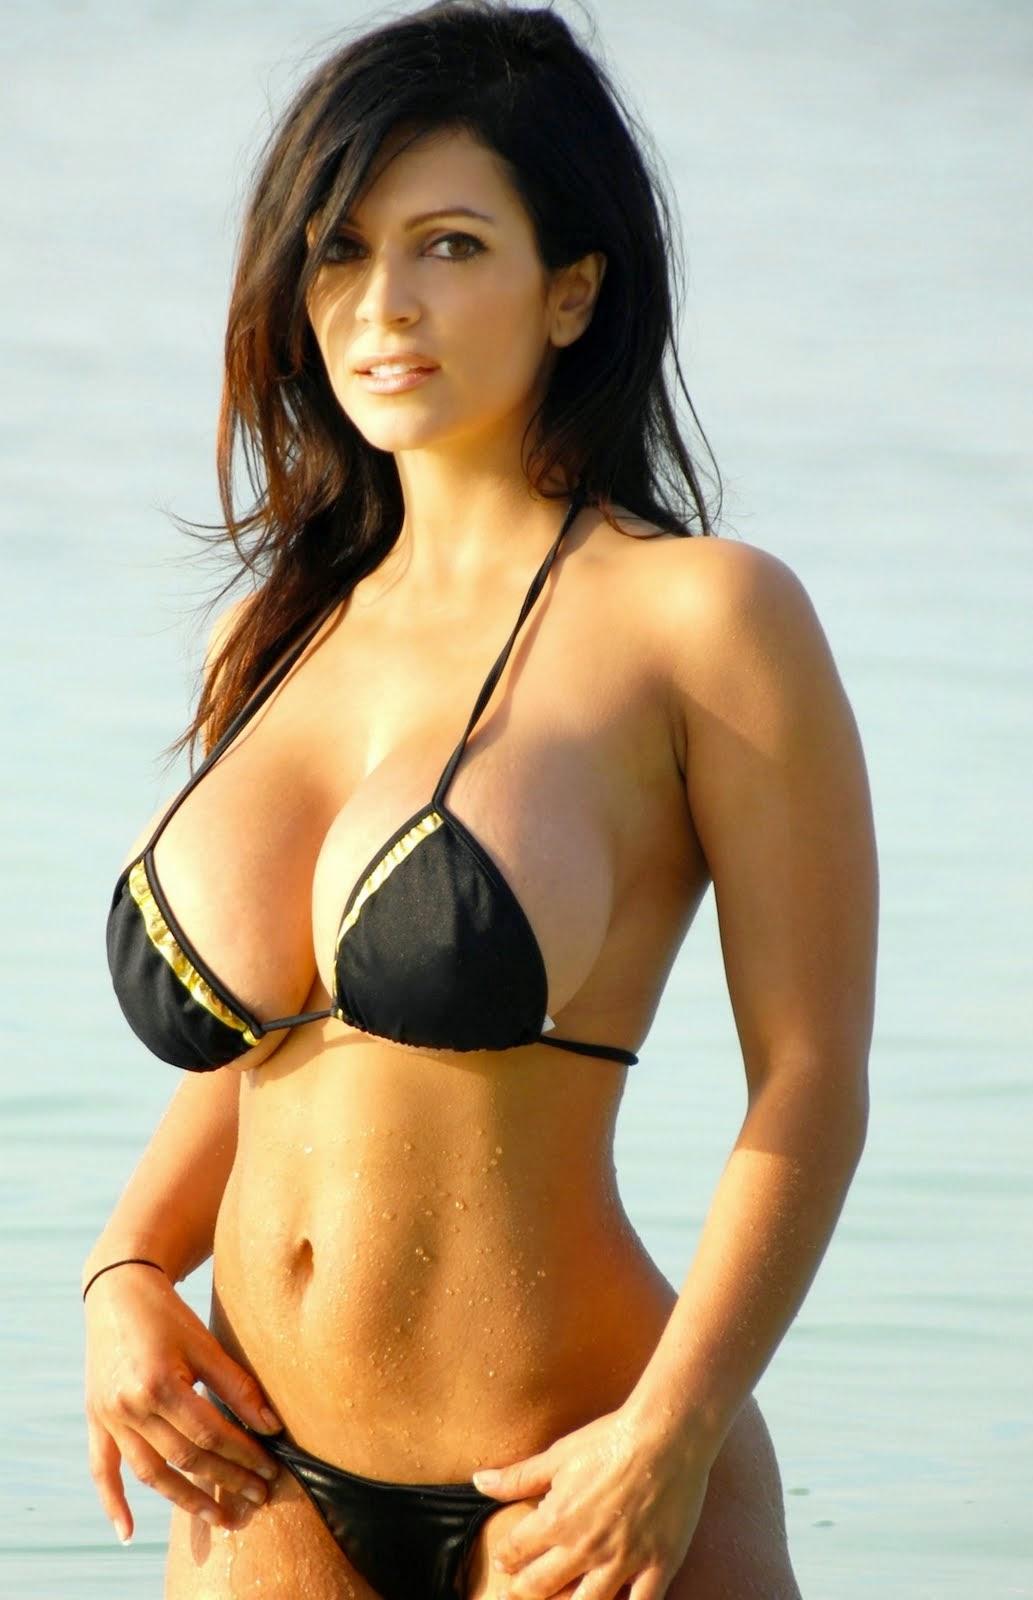 Denise milani sexy black bikini ( Set A ) - Bikini Swimwear